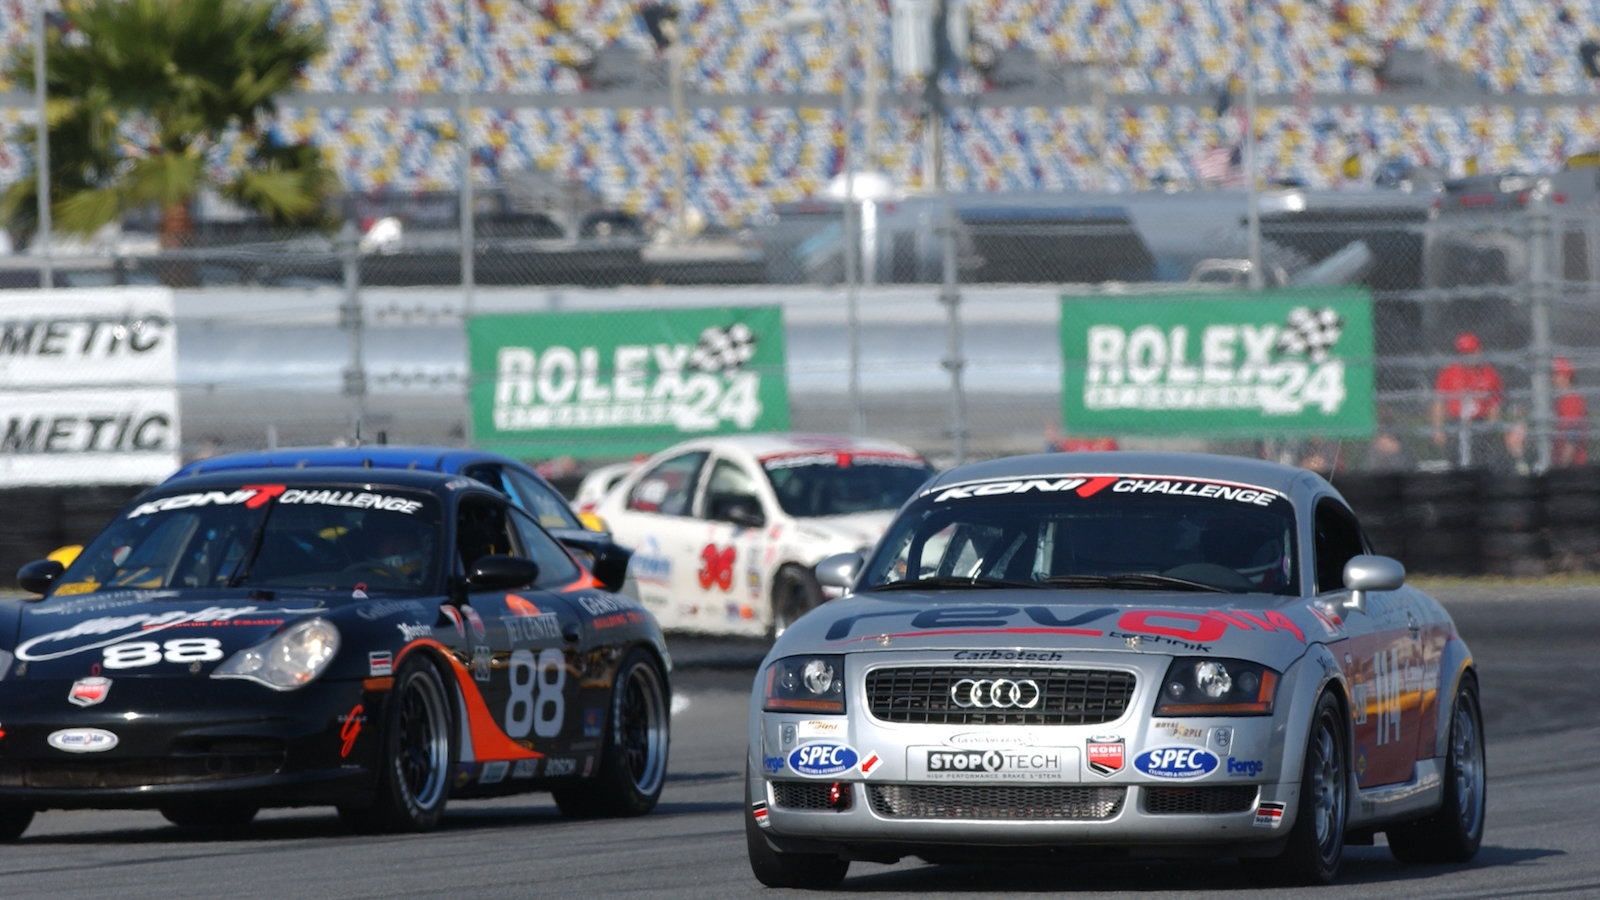 Audi and Motorsports